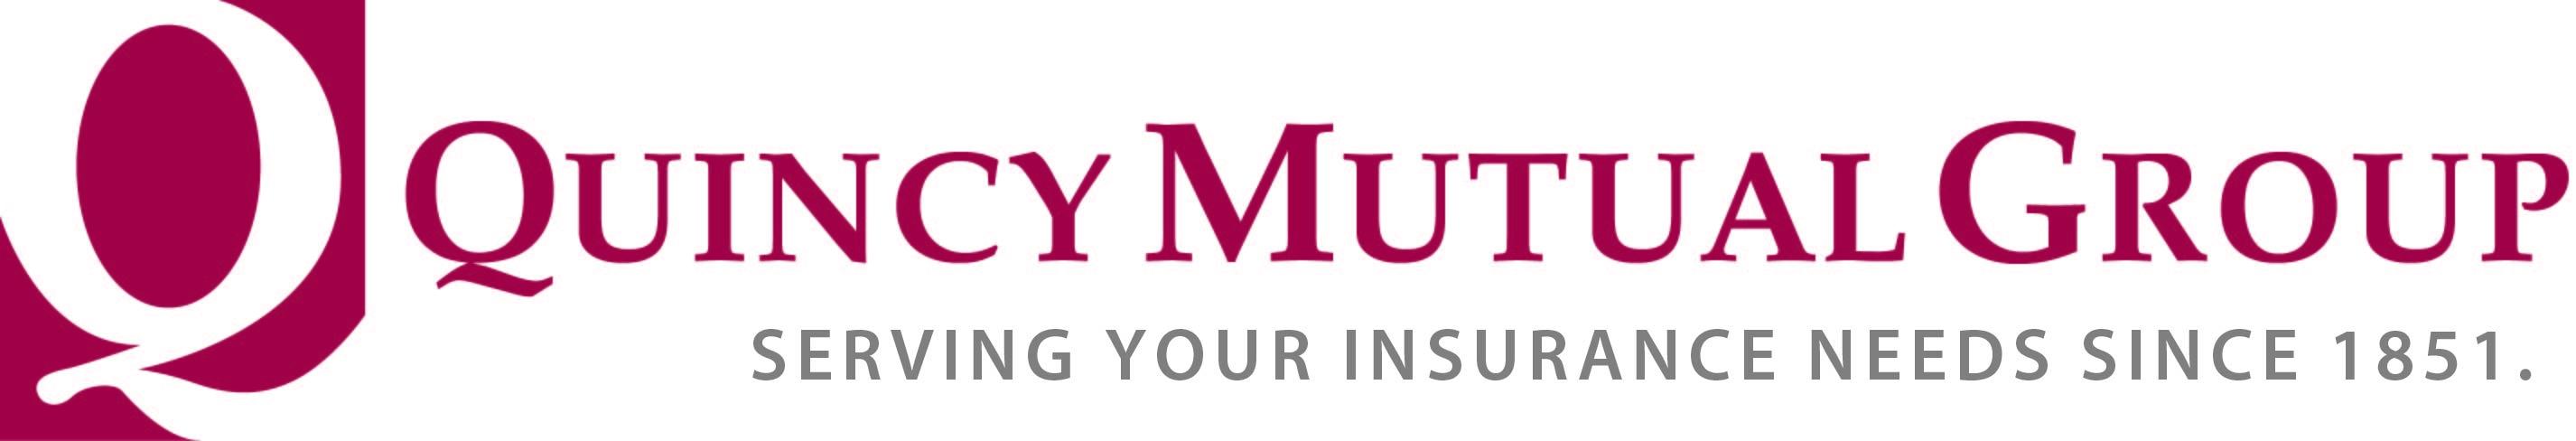 QMG_Logo.jpg